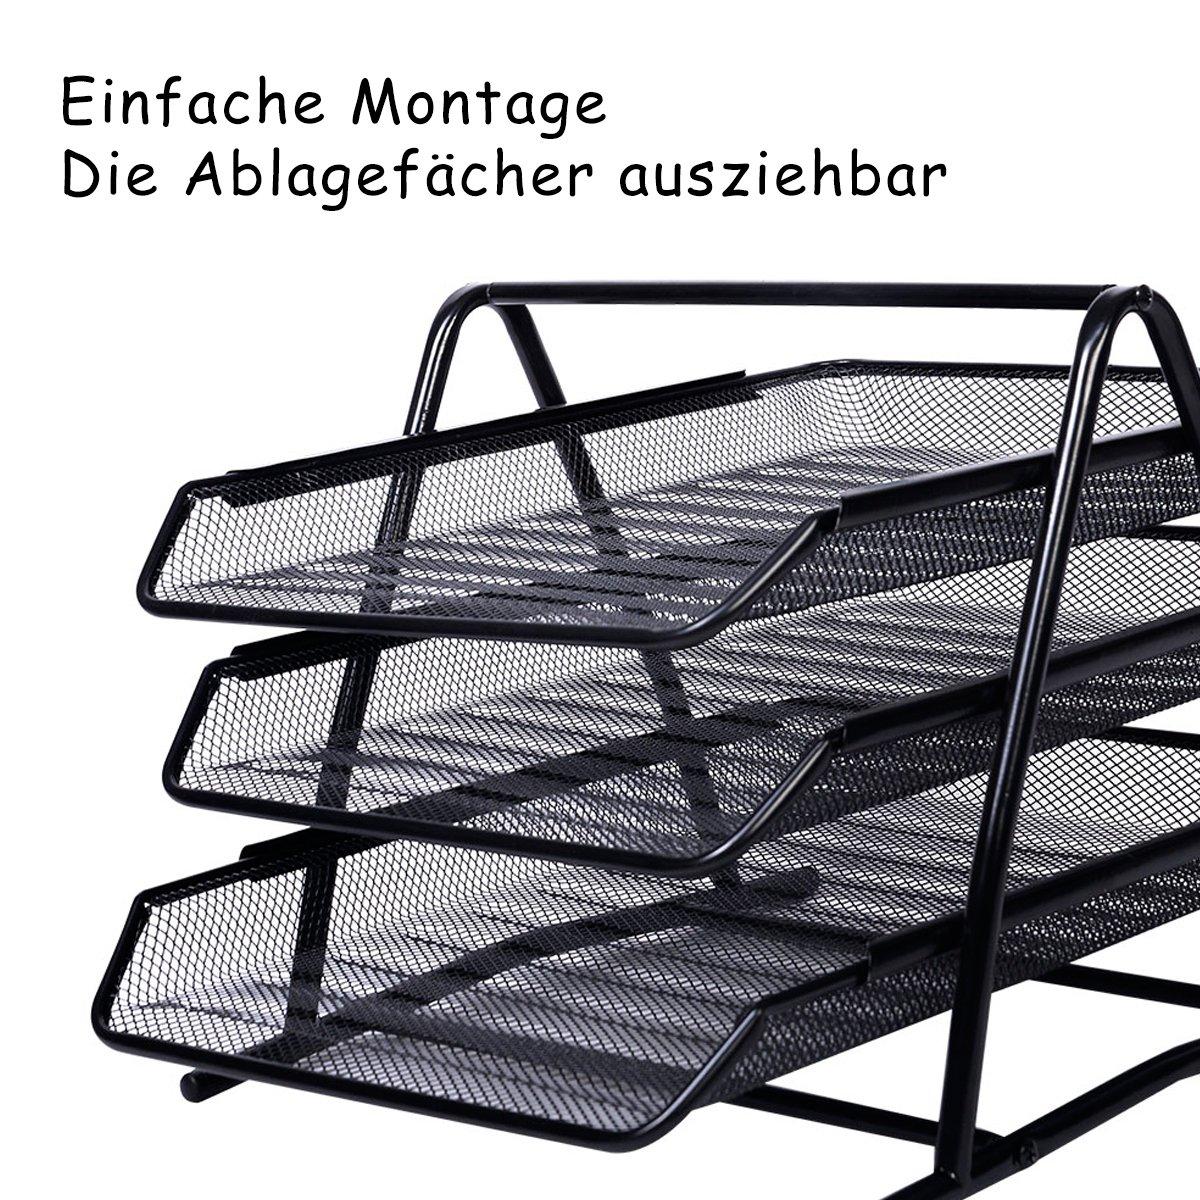 Fein Drahtwaffeln Bilder - Elektrische Schaltplan-Ideen ...